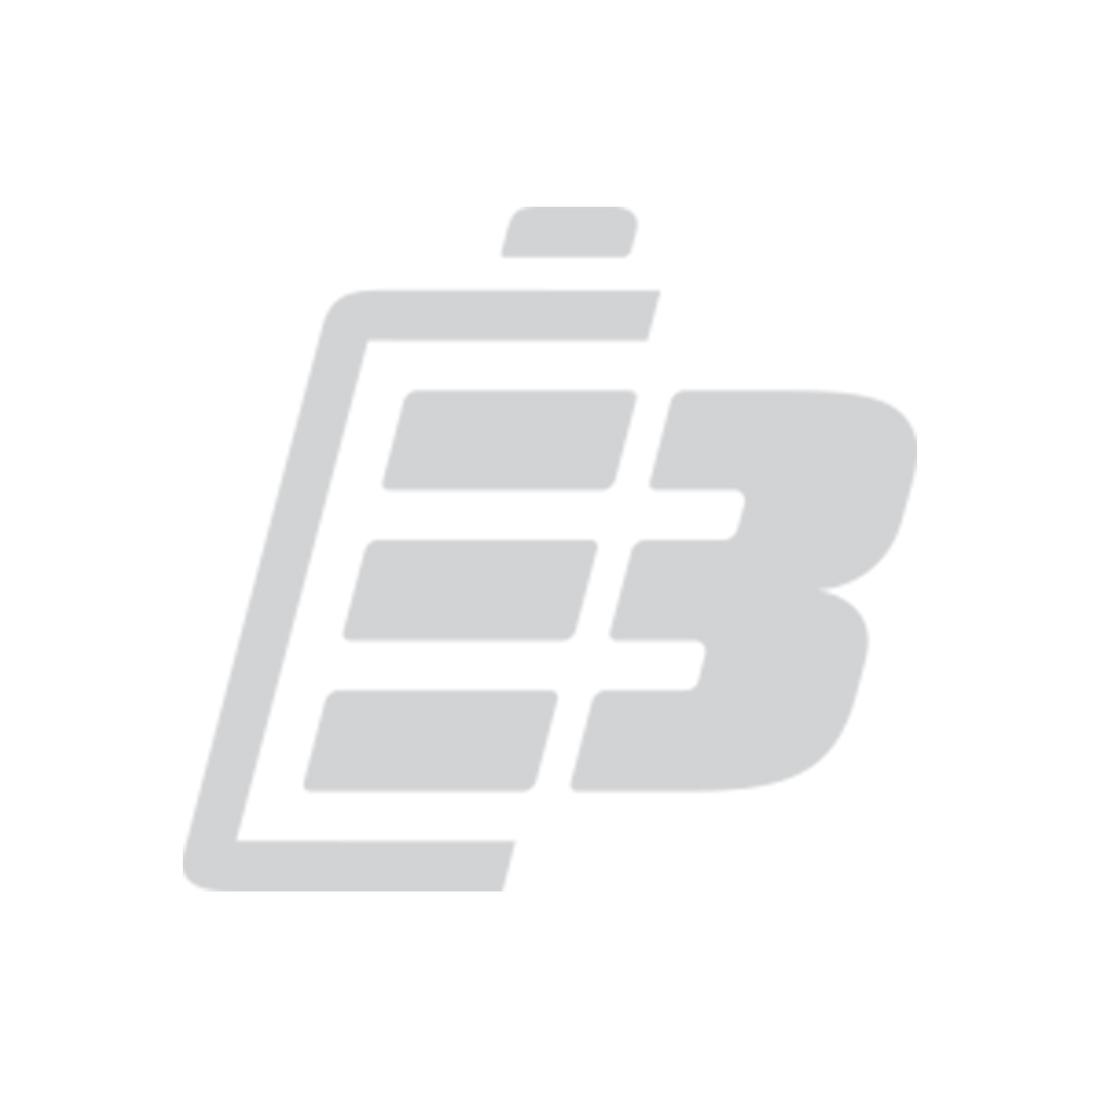 Laptop battery Acer Aspire ES1-531_1